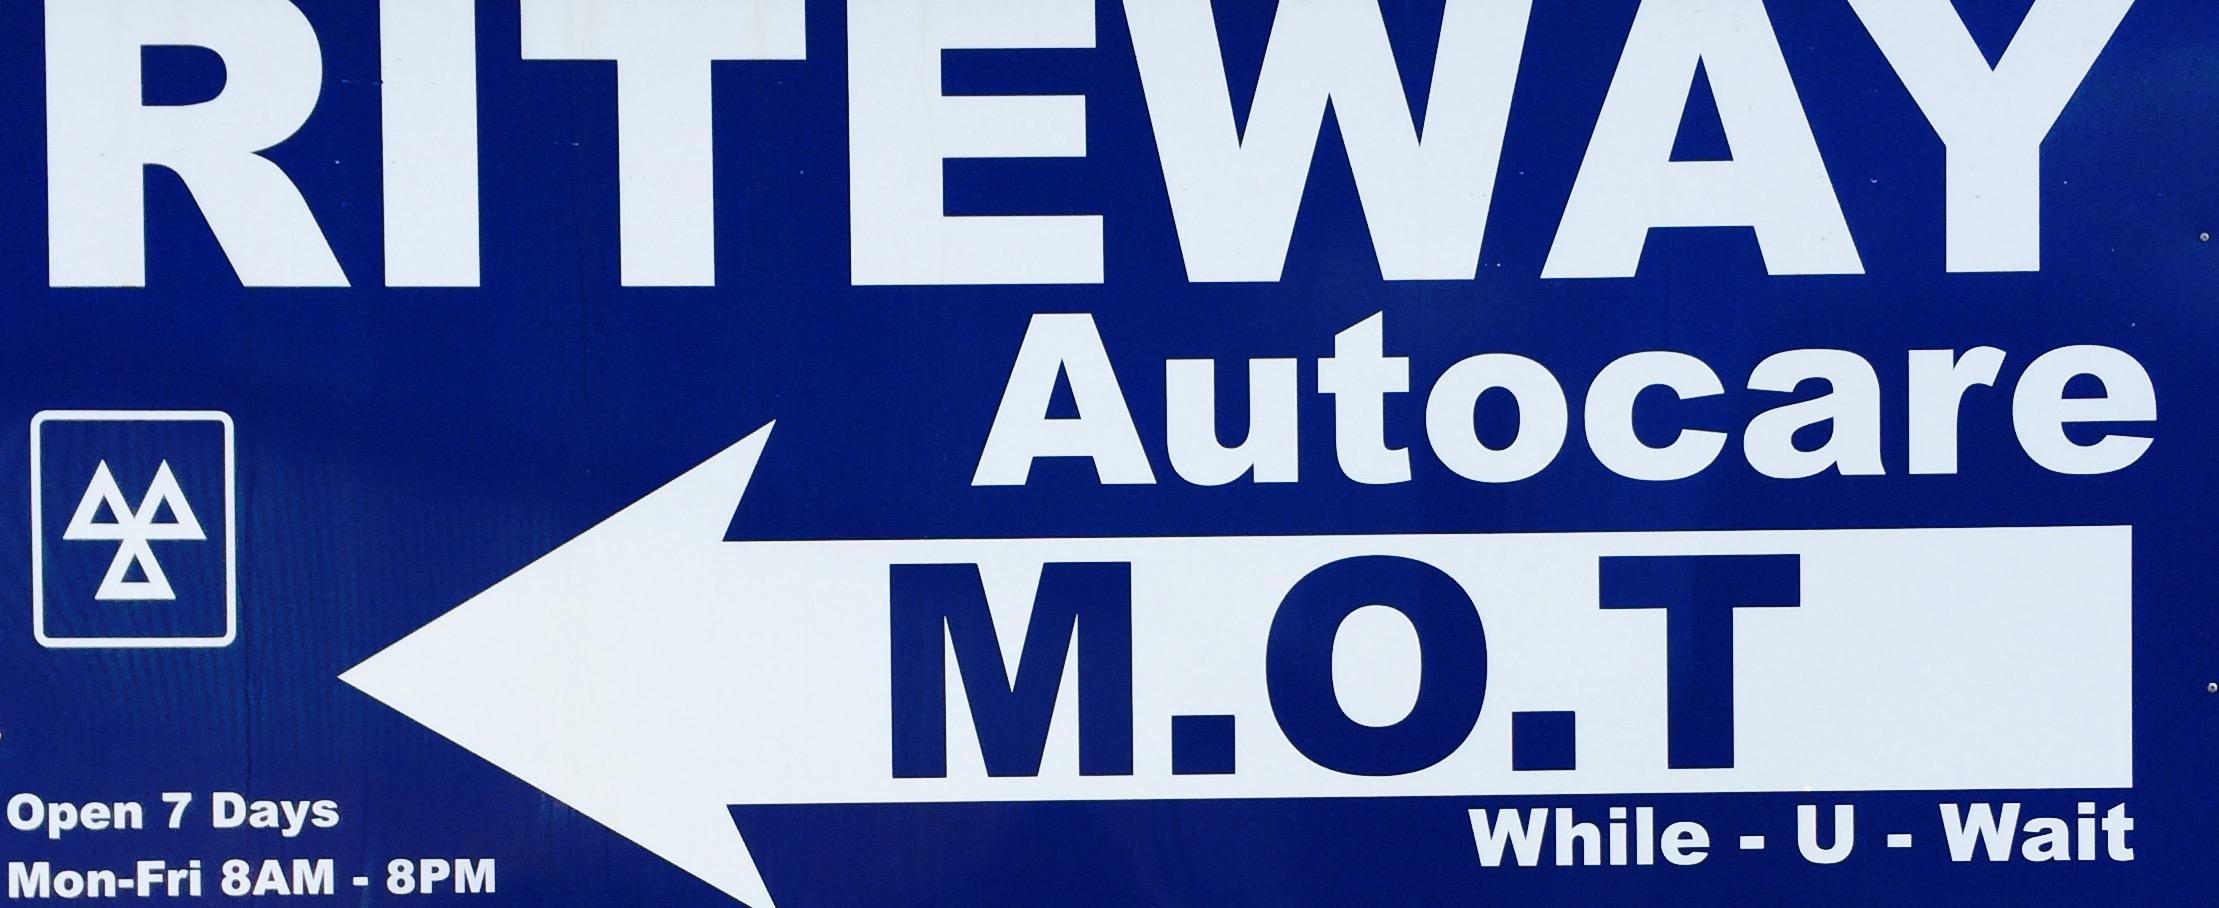 Riteway Autocare Logo